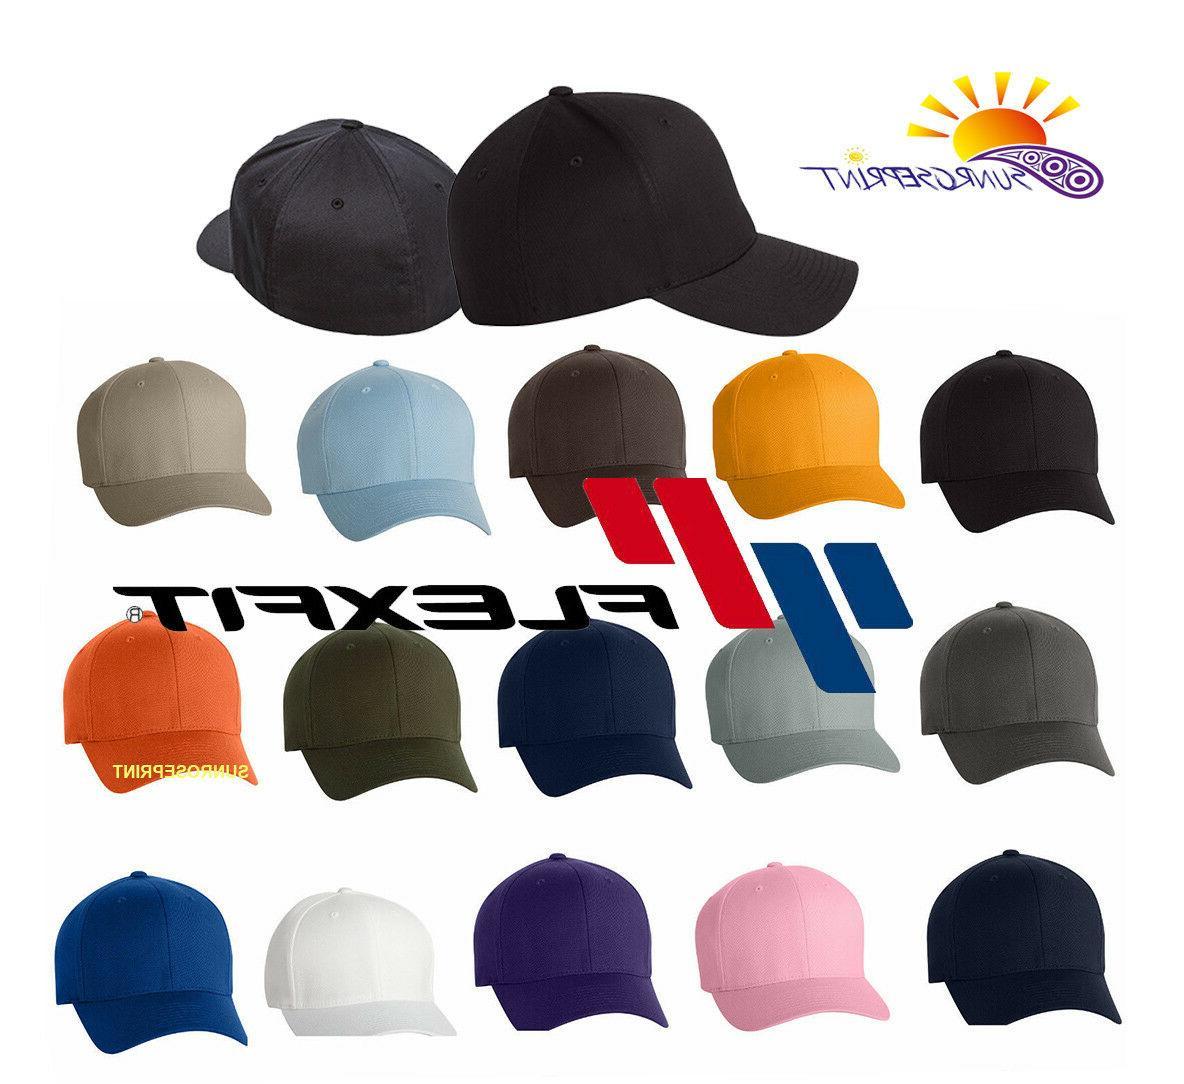 12 classic blank baseball cap6277 hat wholesale